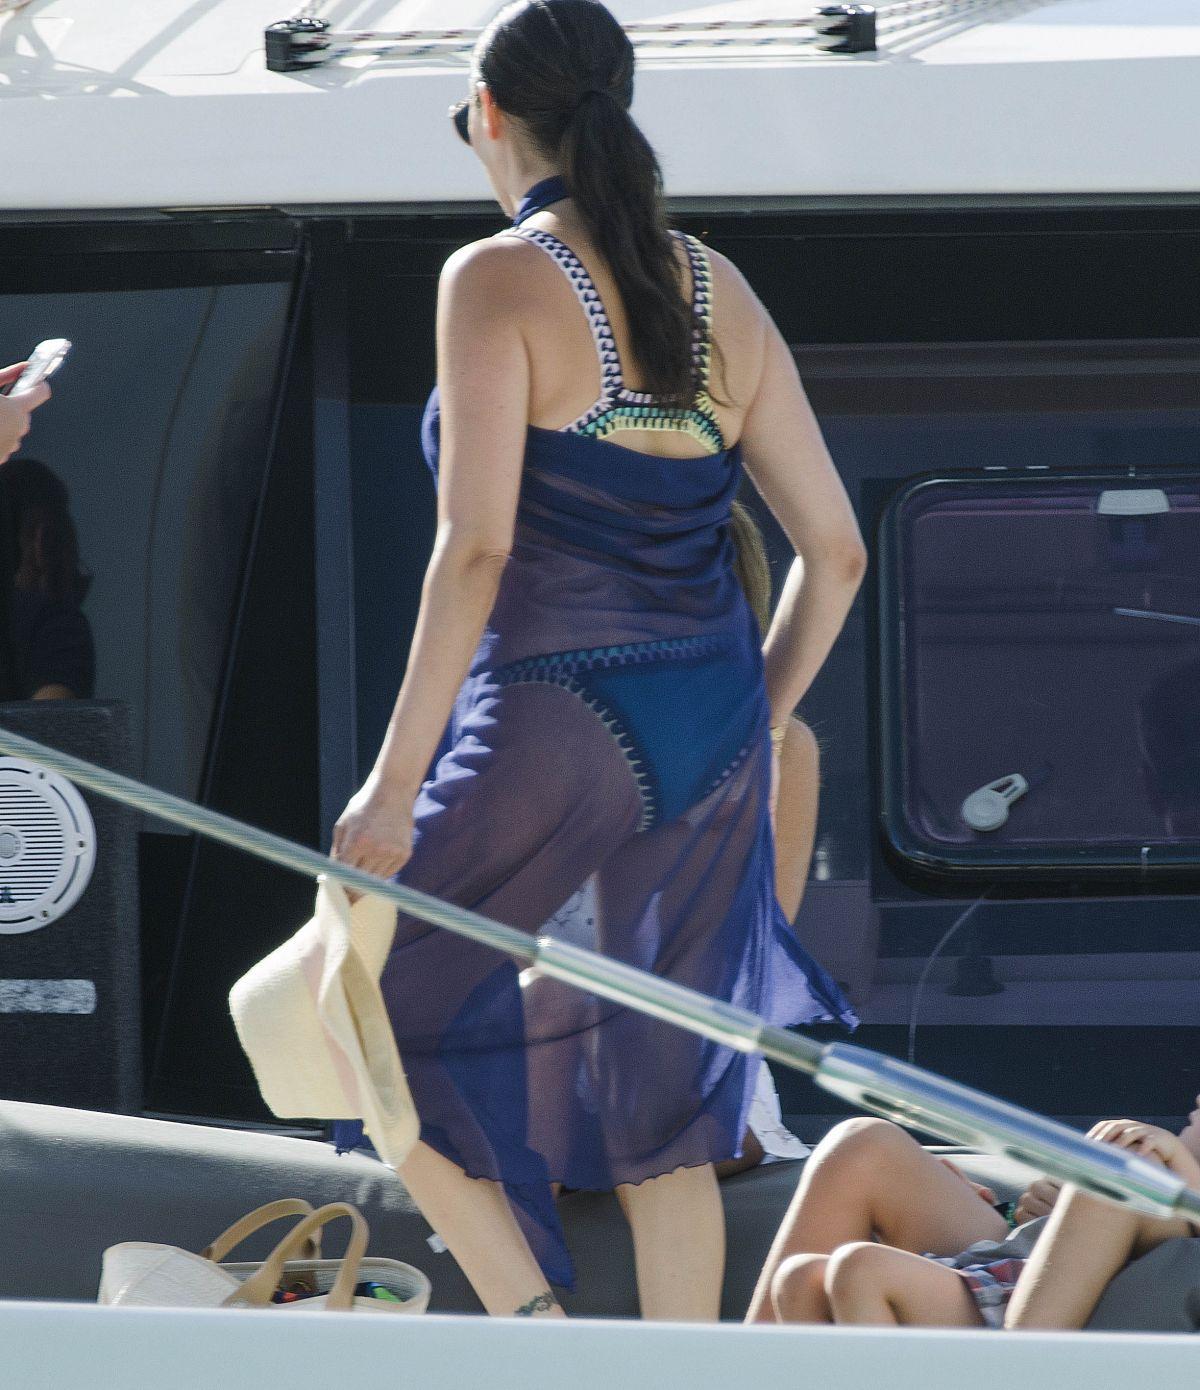 Sofia Jamora in Bikini on the beach in Maui Pic 6 of 35